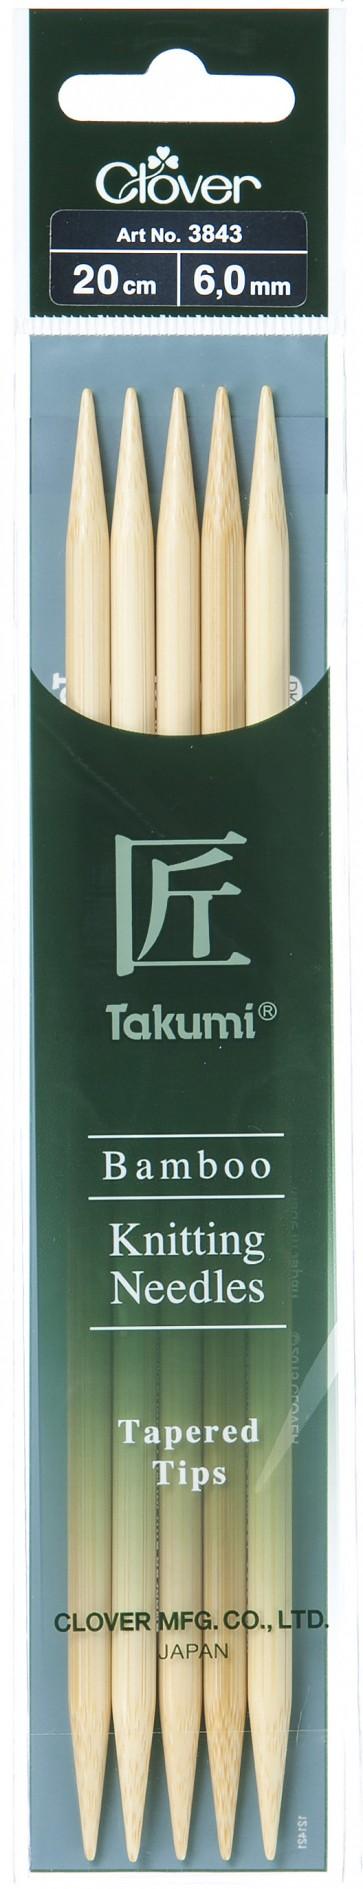 CLOVER Strumpfstrickndl Bambus Takumi 20cm/6.00mm